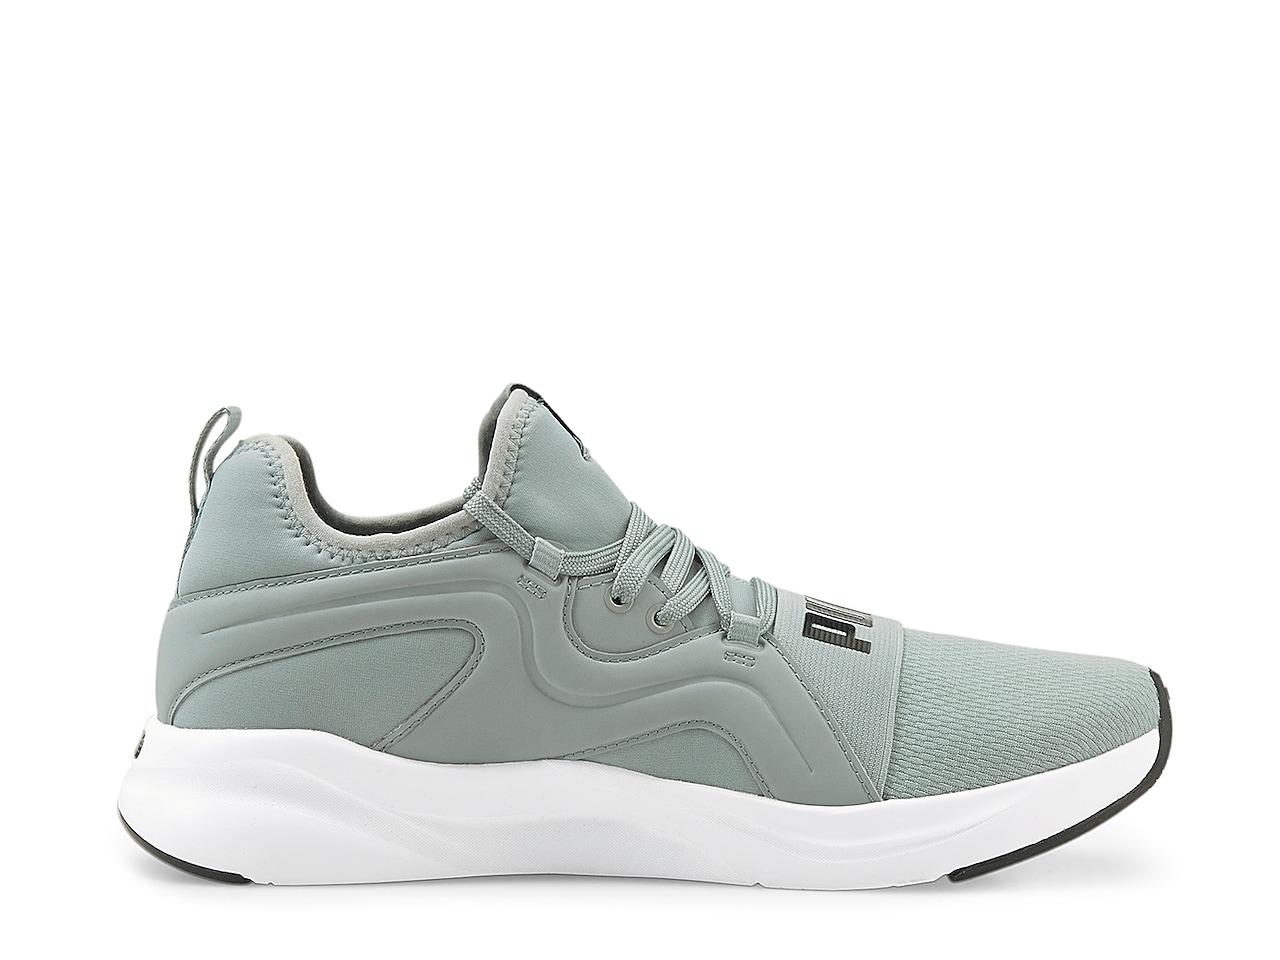 Puma Softride Rift Breeze Running Shoe - Men's